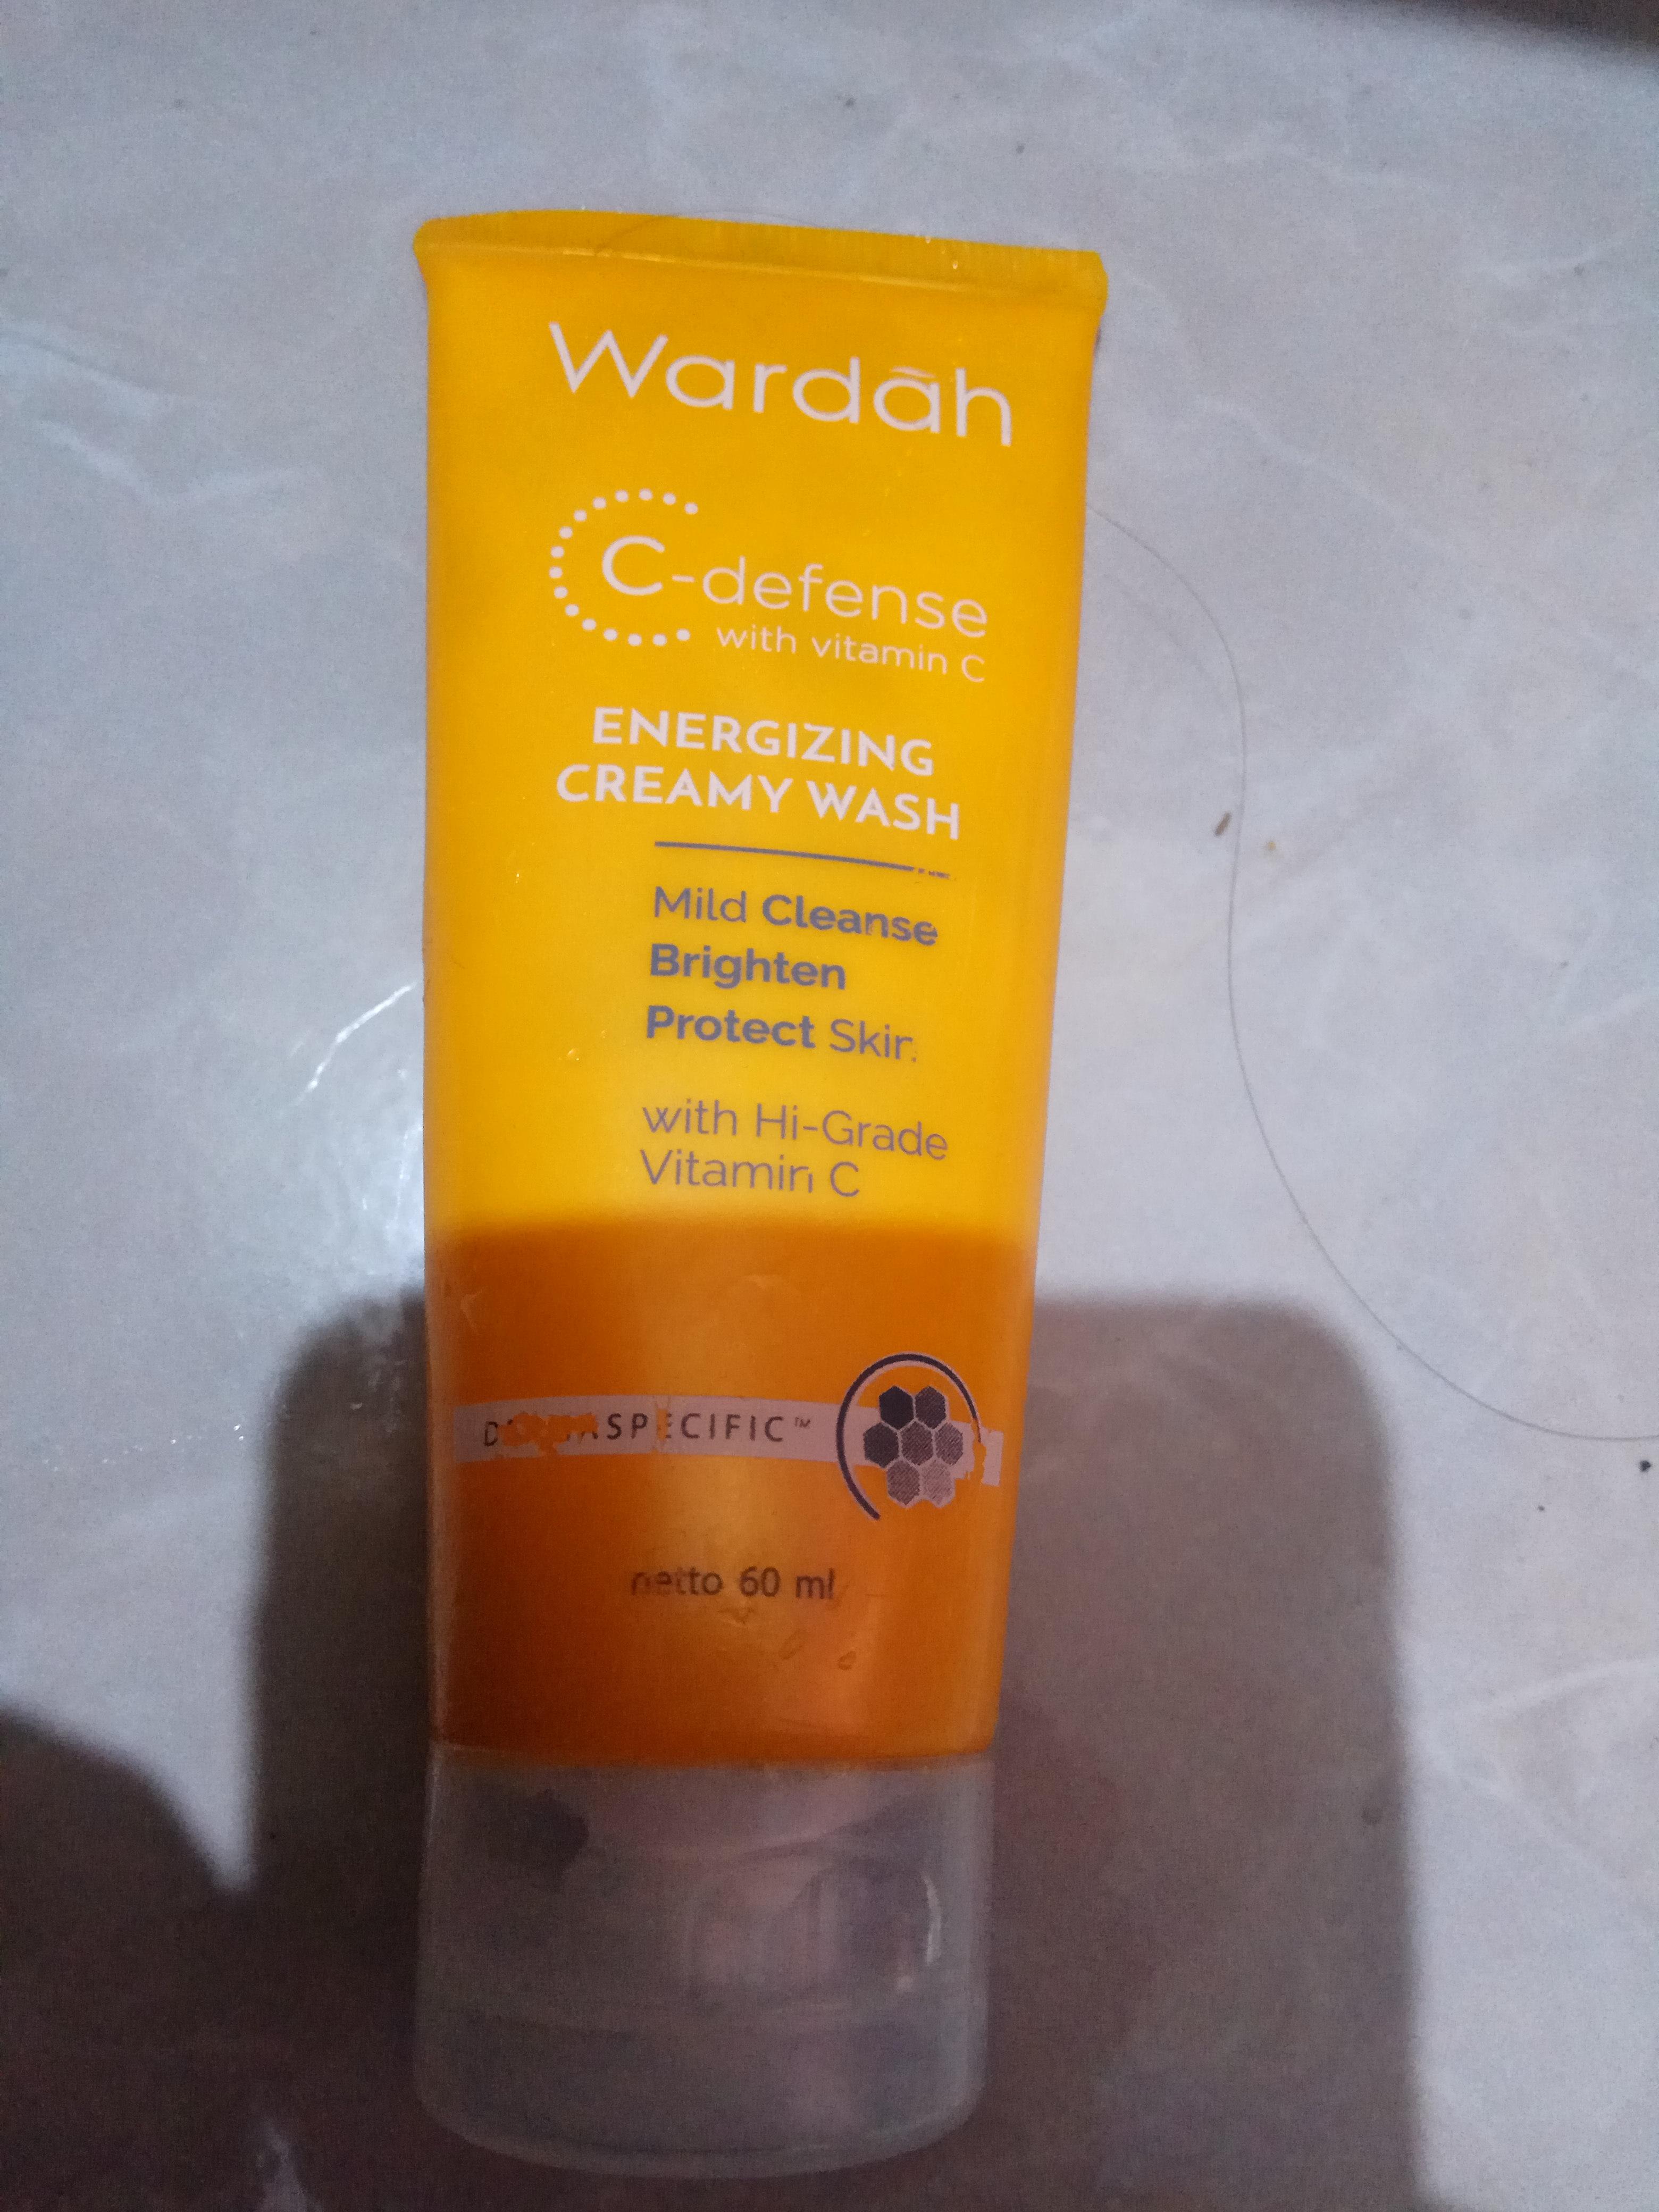 Wardah C Defense Energizing Creamy Wash